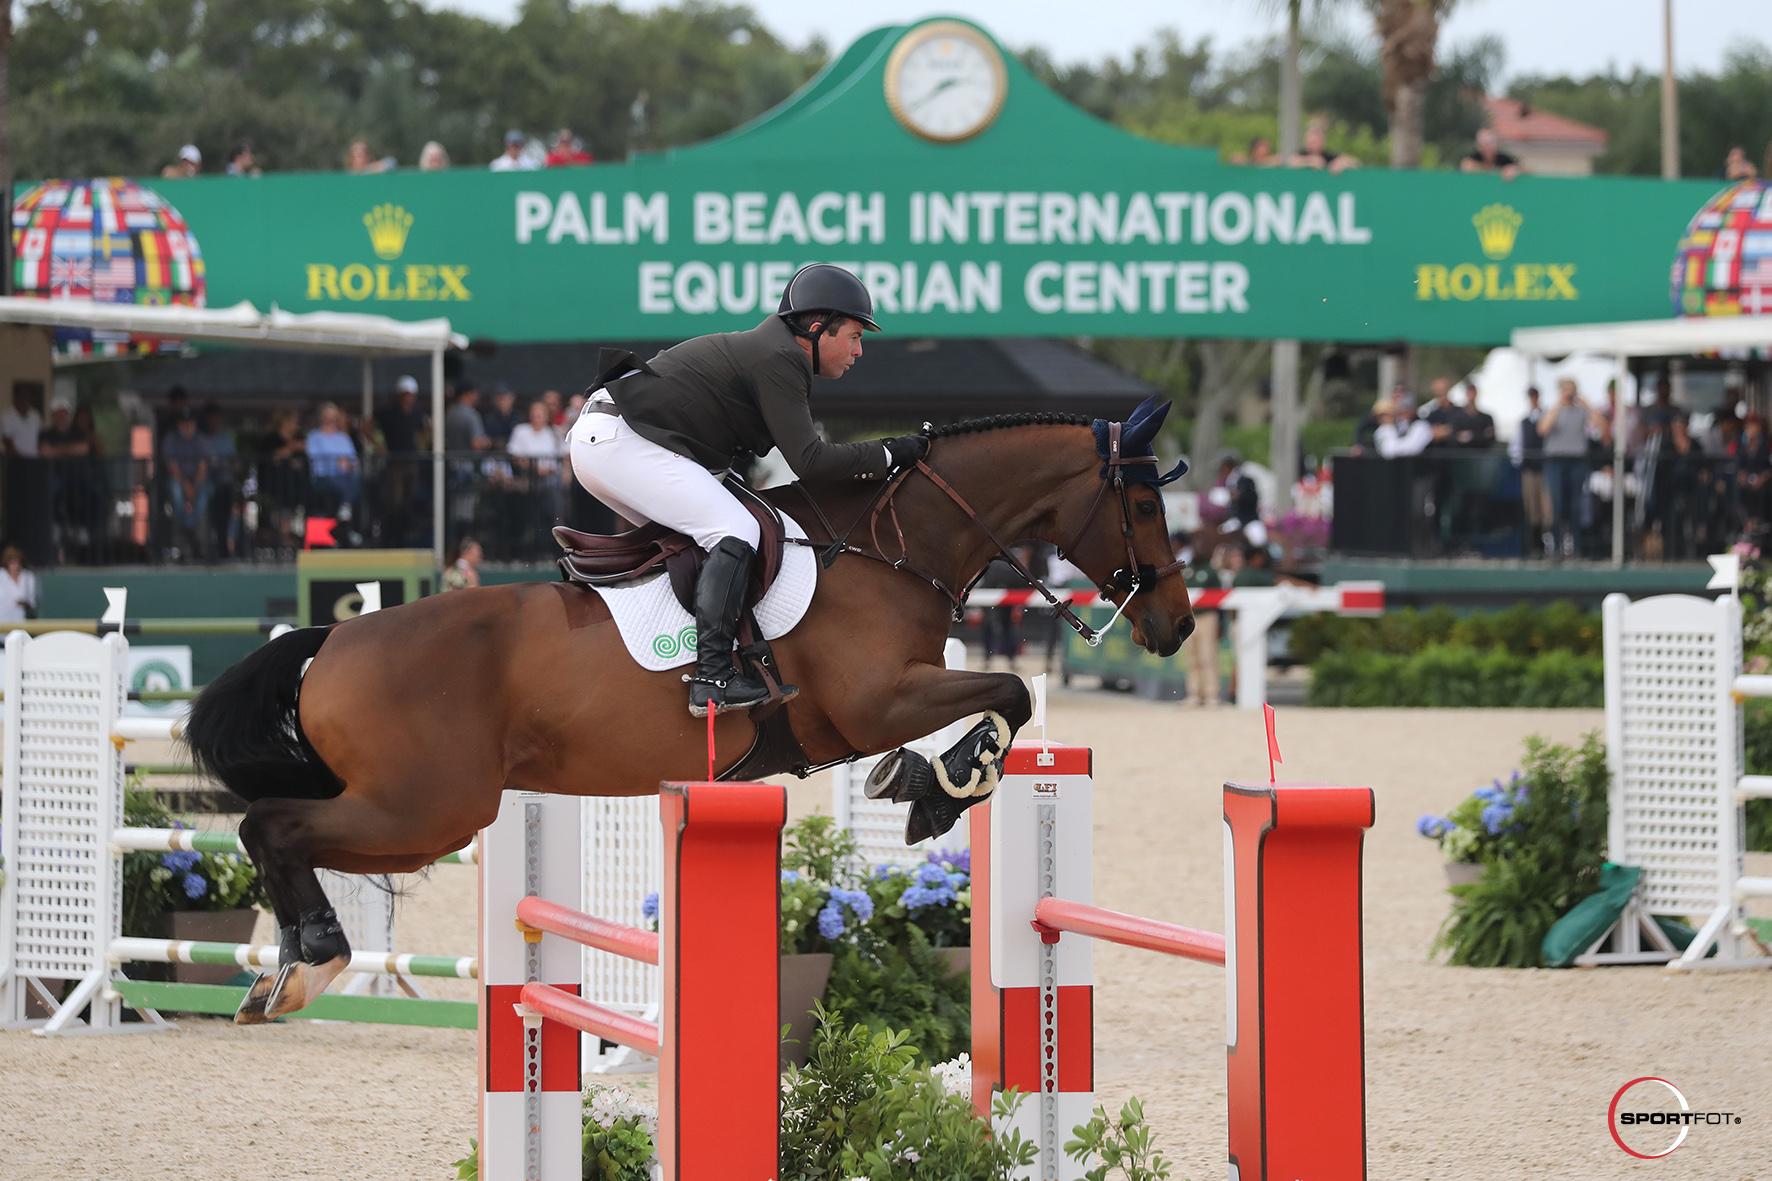 Cian O'Connor Claims First Grand Prix at Winter Equestrian Festival